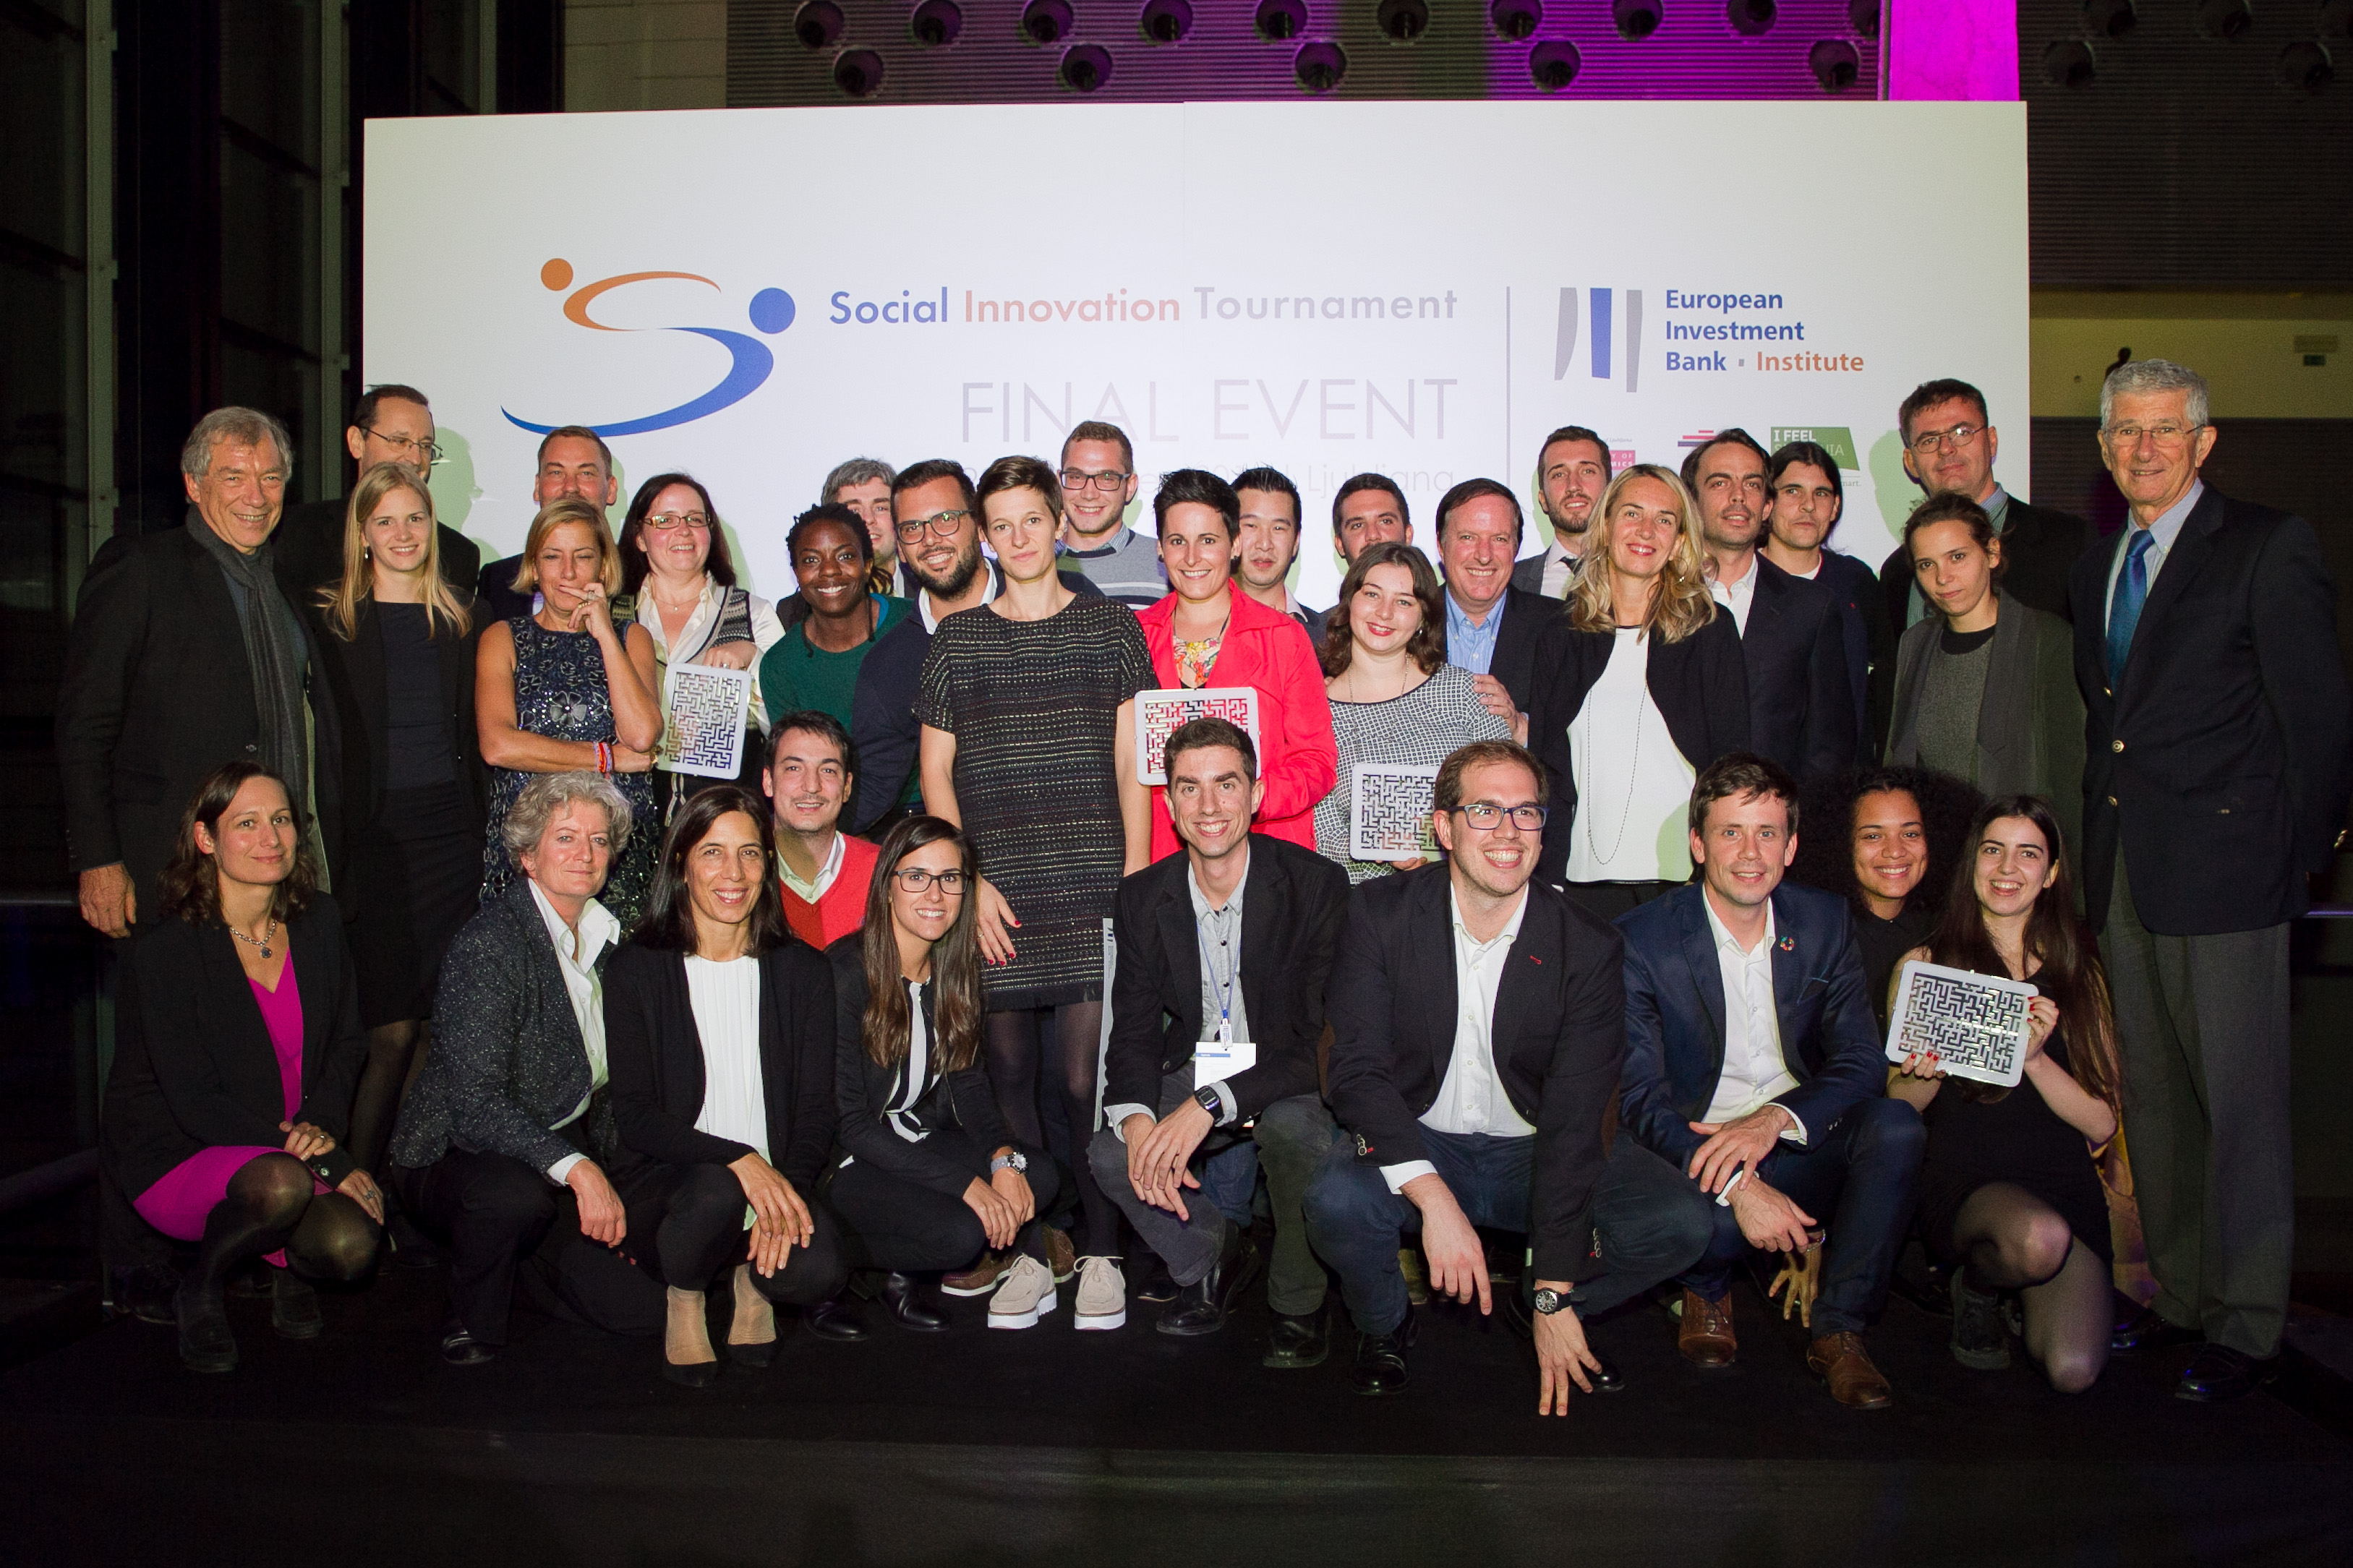 European Investment Bank Institute Social Innovation Tournament 2019